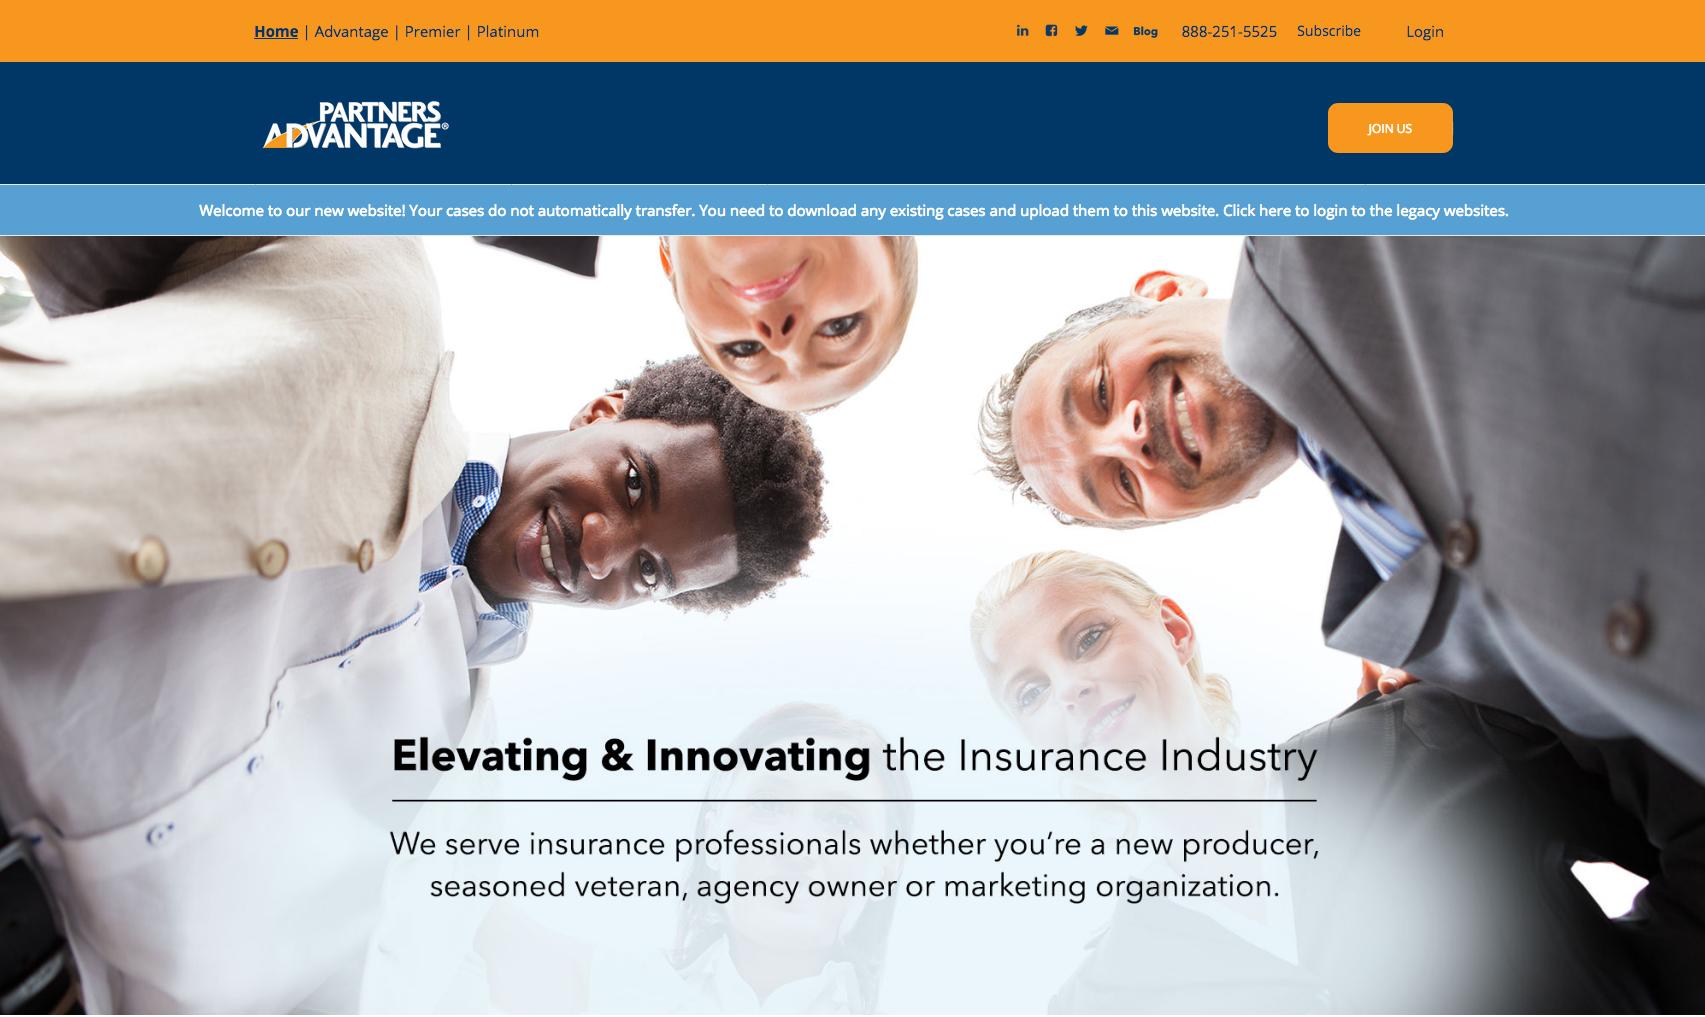 New Partners Advantage Website